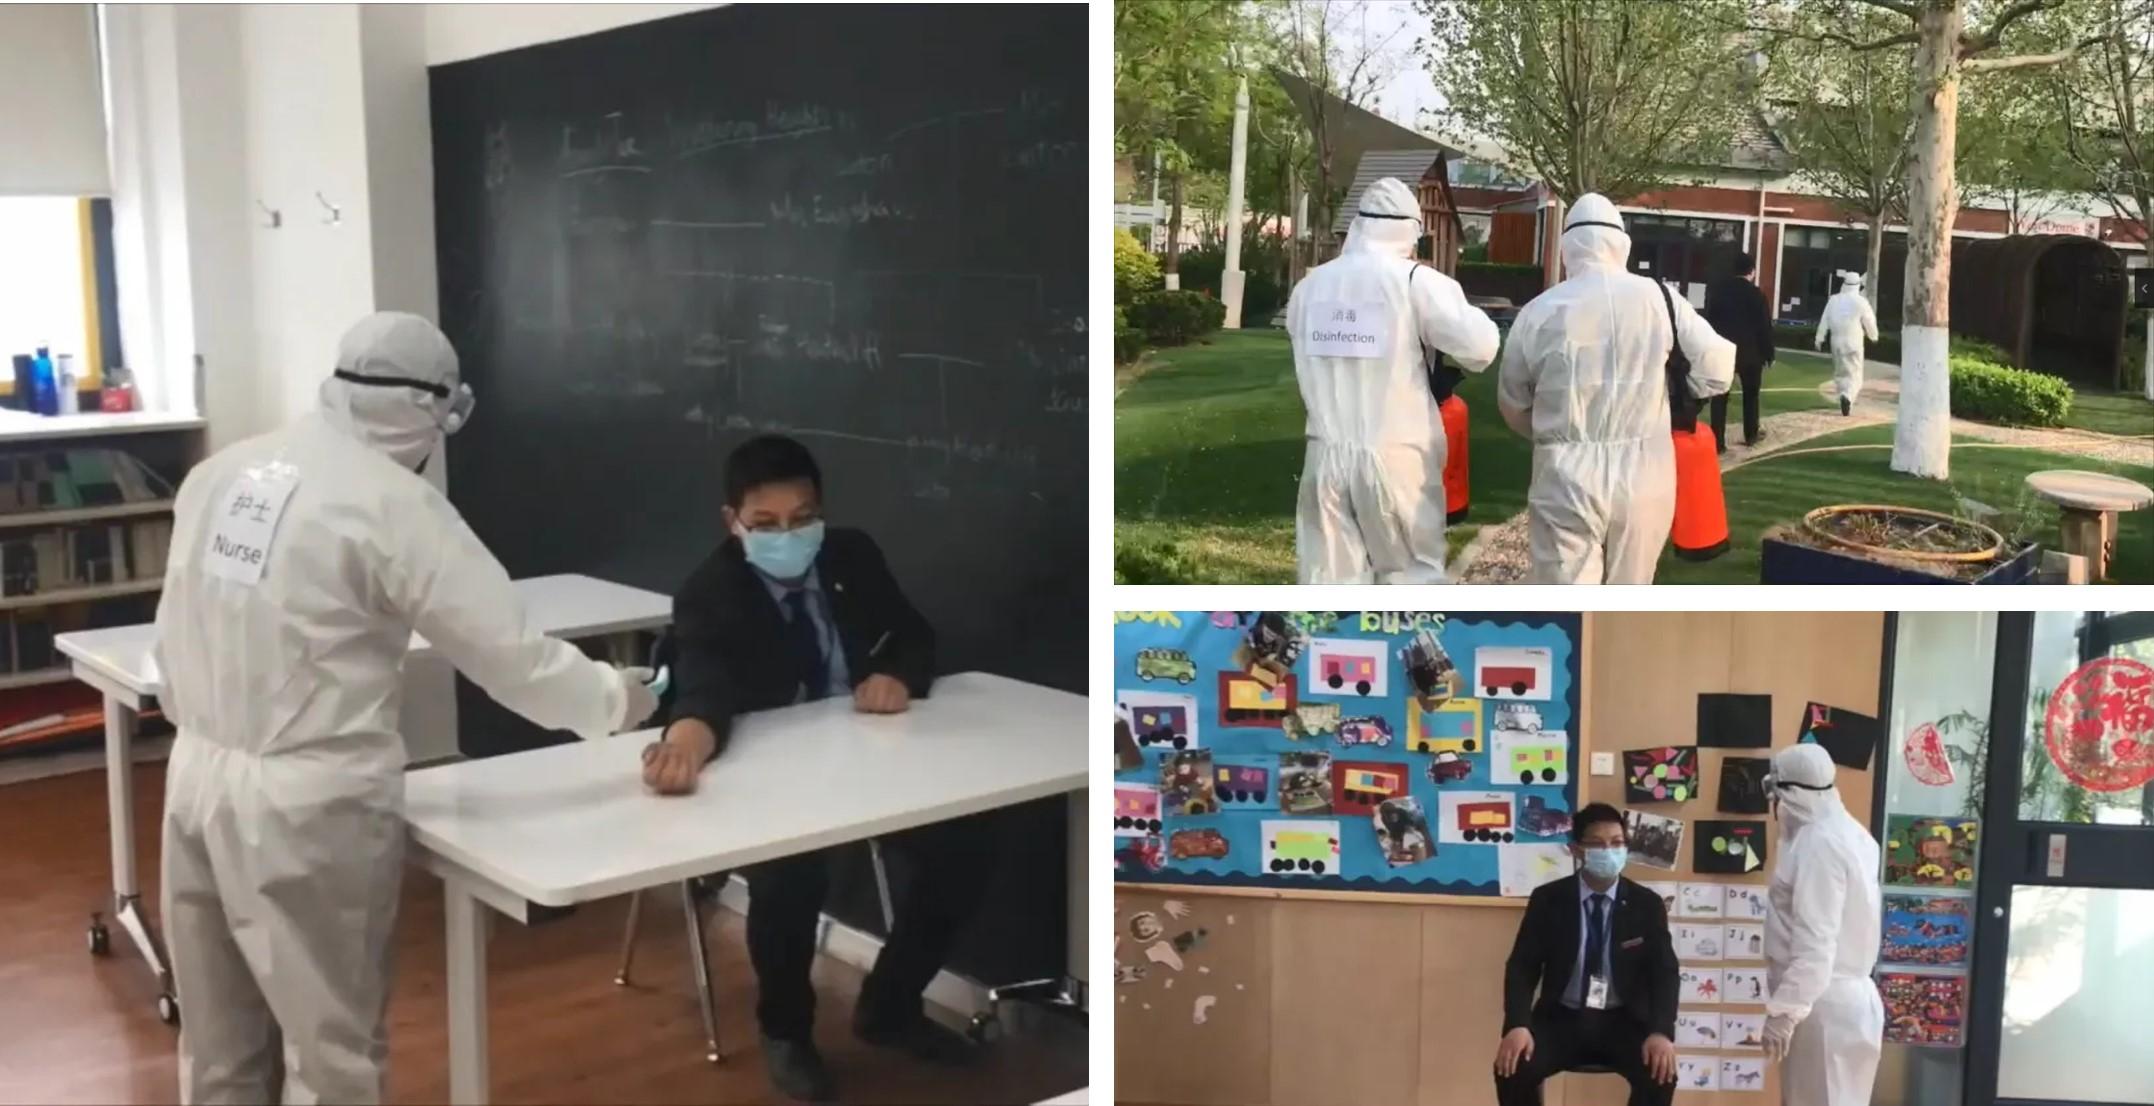 drill-Dulwich_College_Beijing-20200904-170519-223